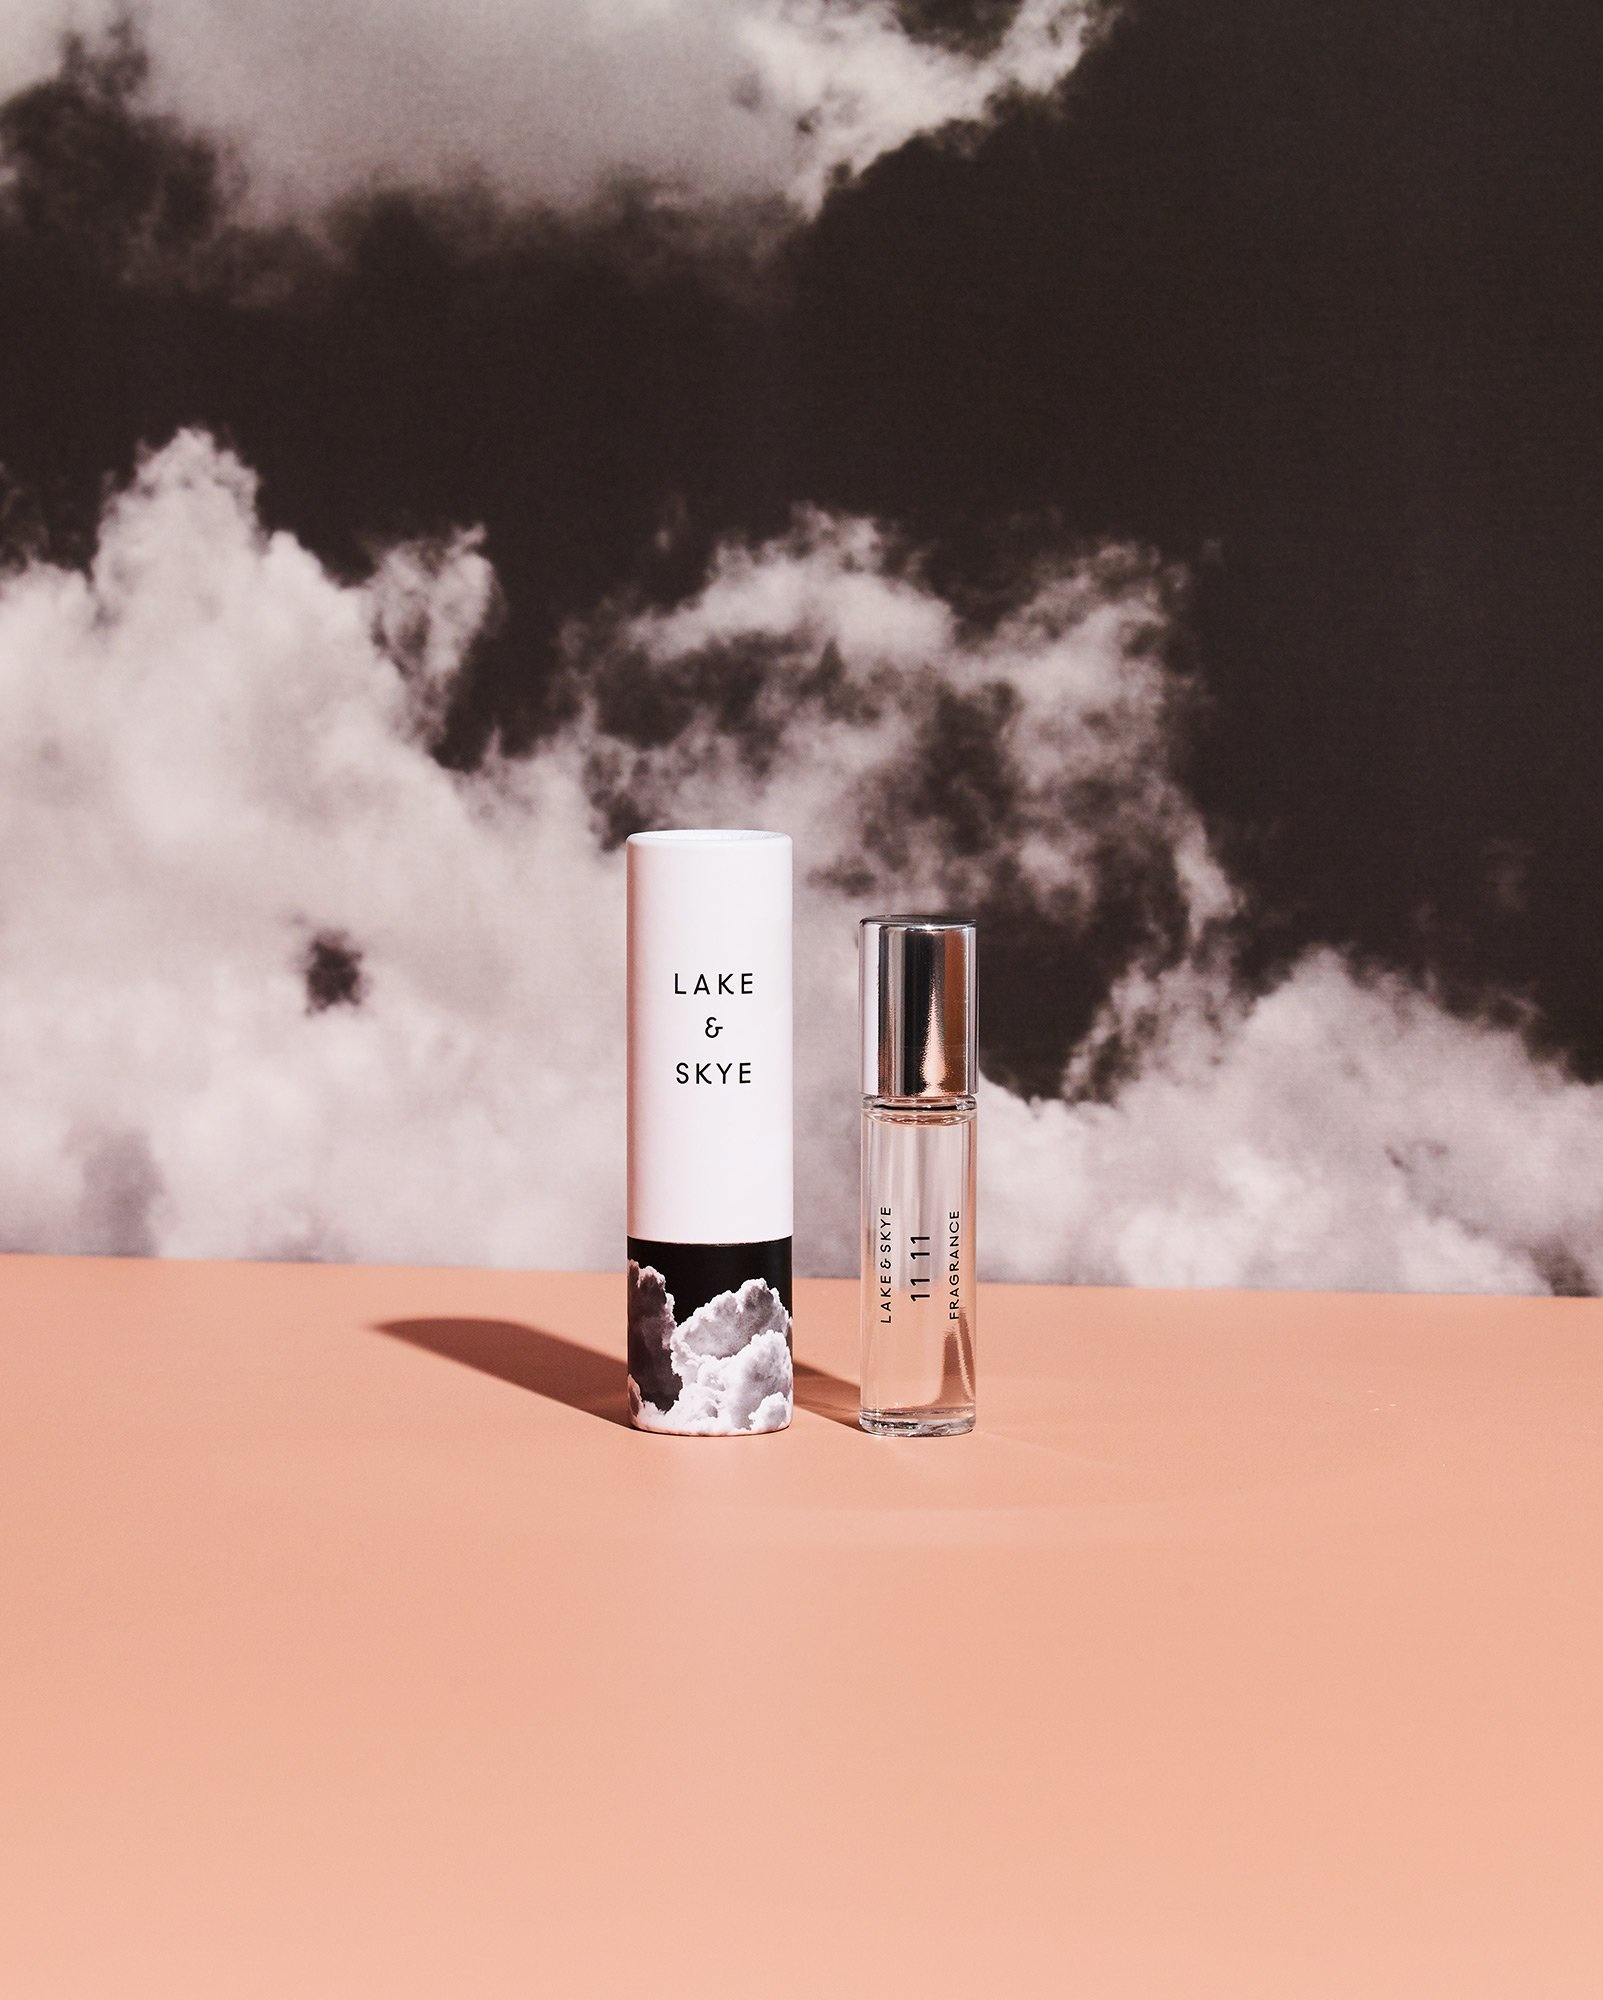 Lake & Skye 11 11 Rollerball Perfume